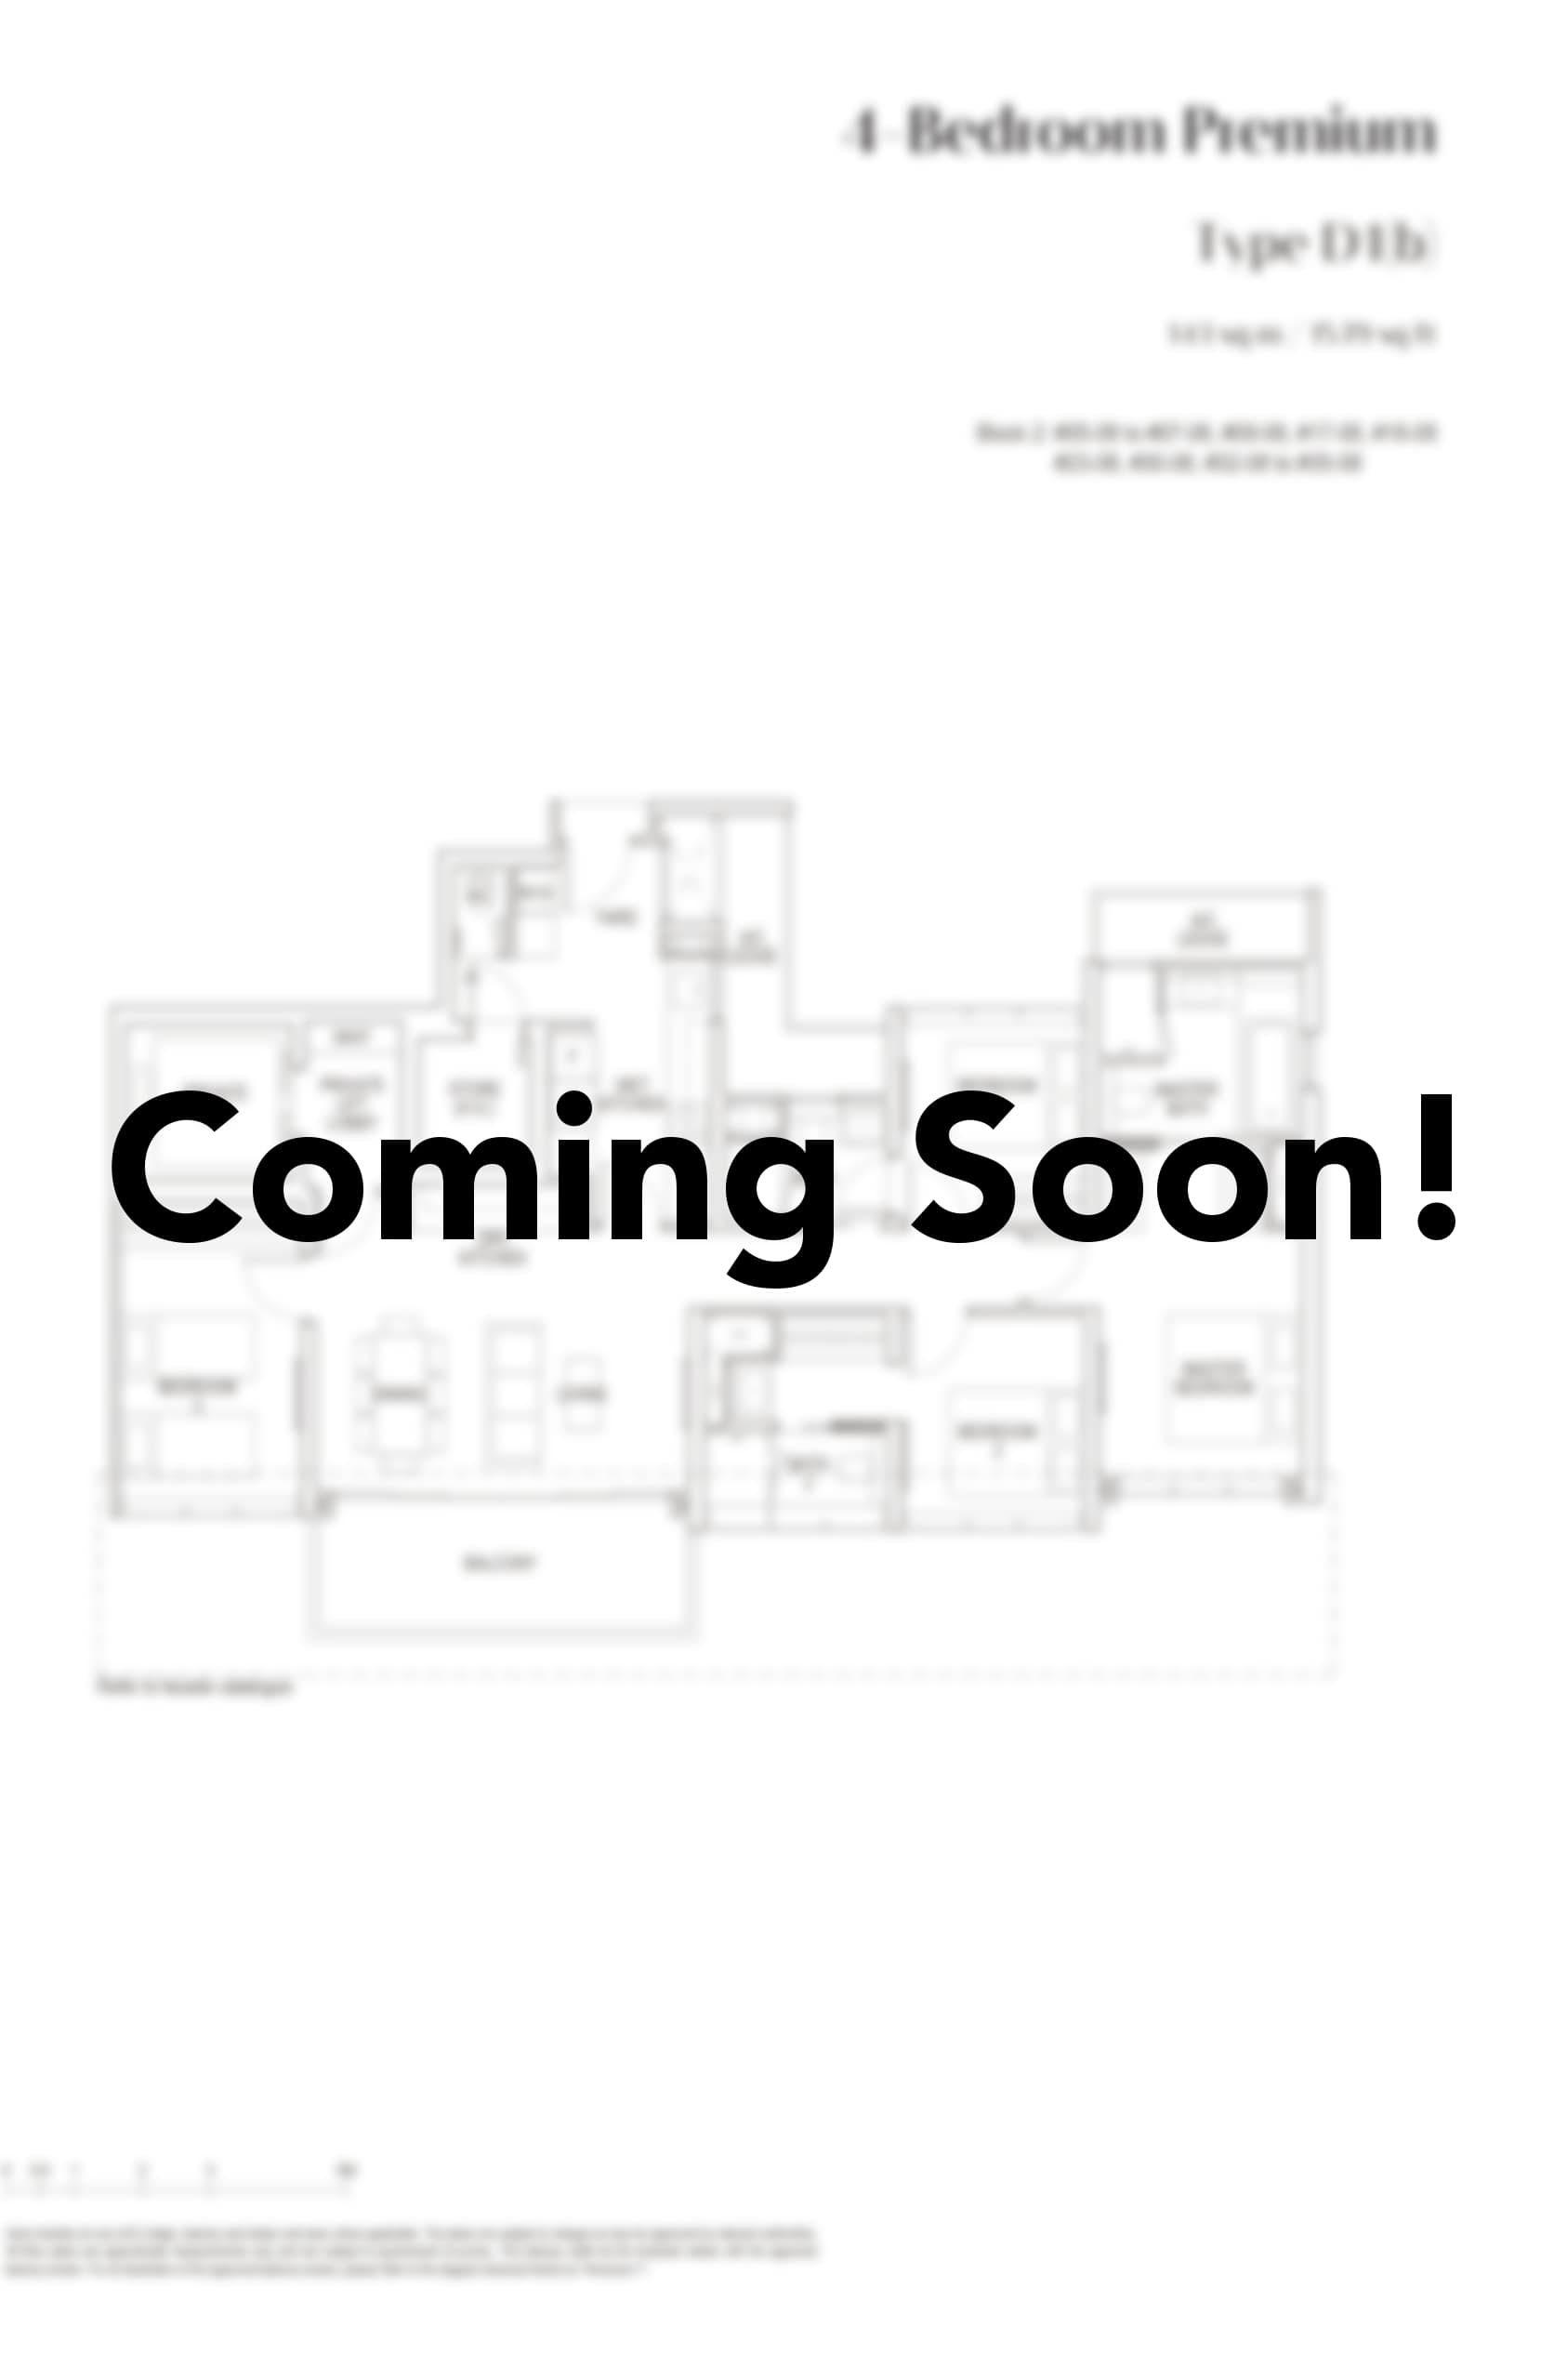 pasir ris 8 Floor Plan 4 Bedroom premium D1b